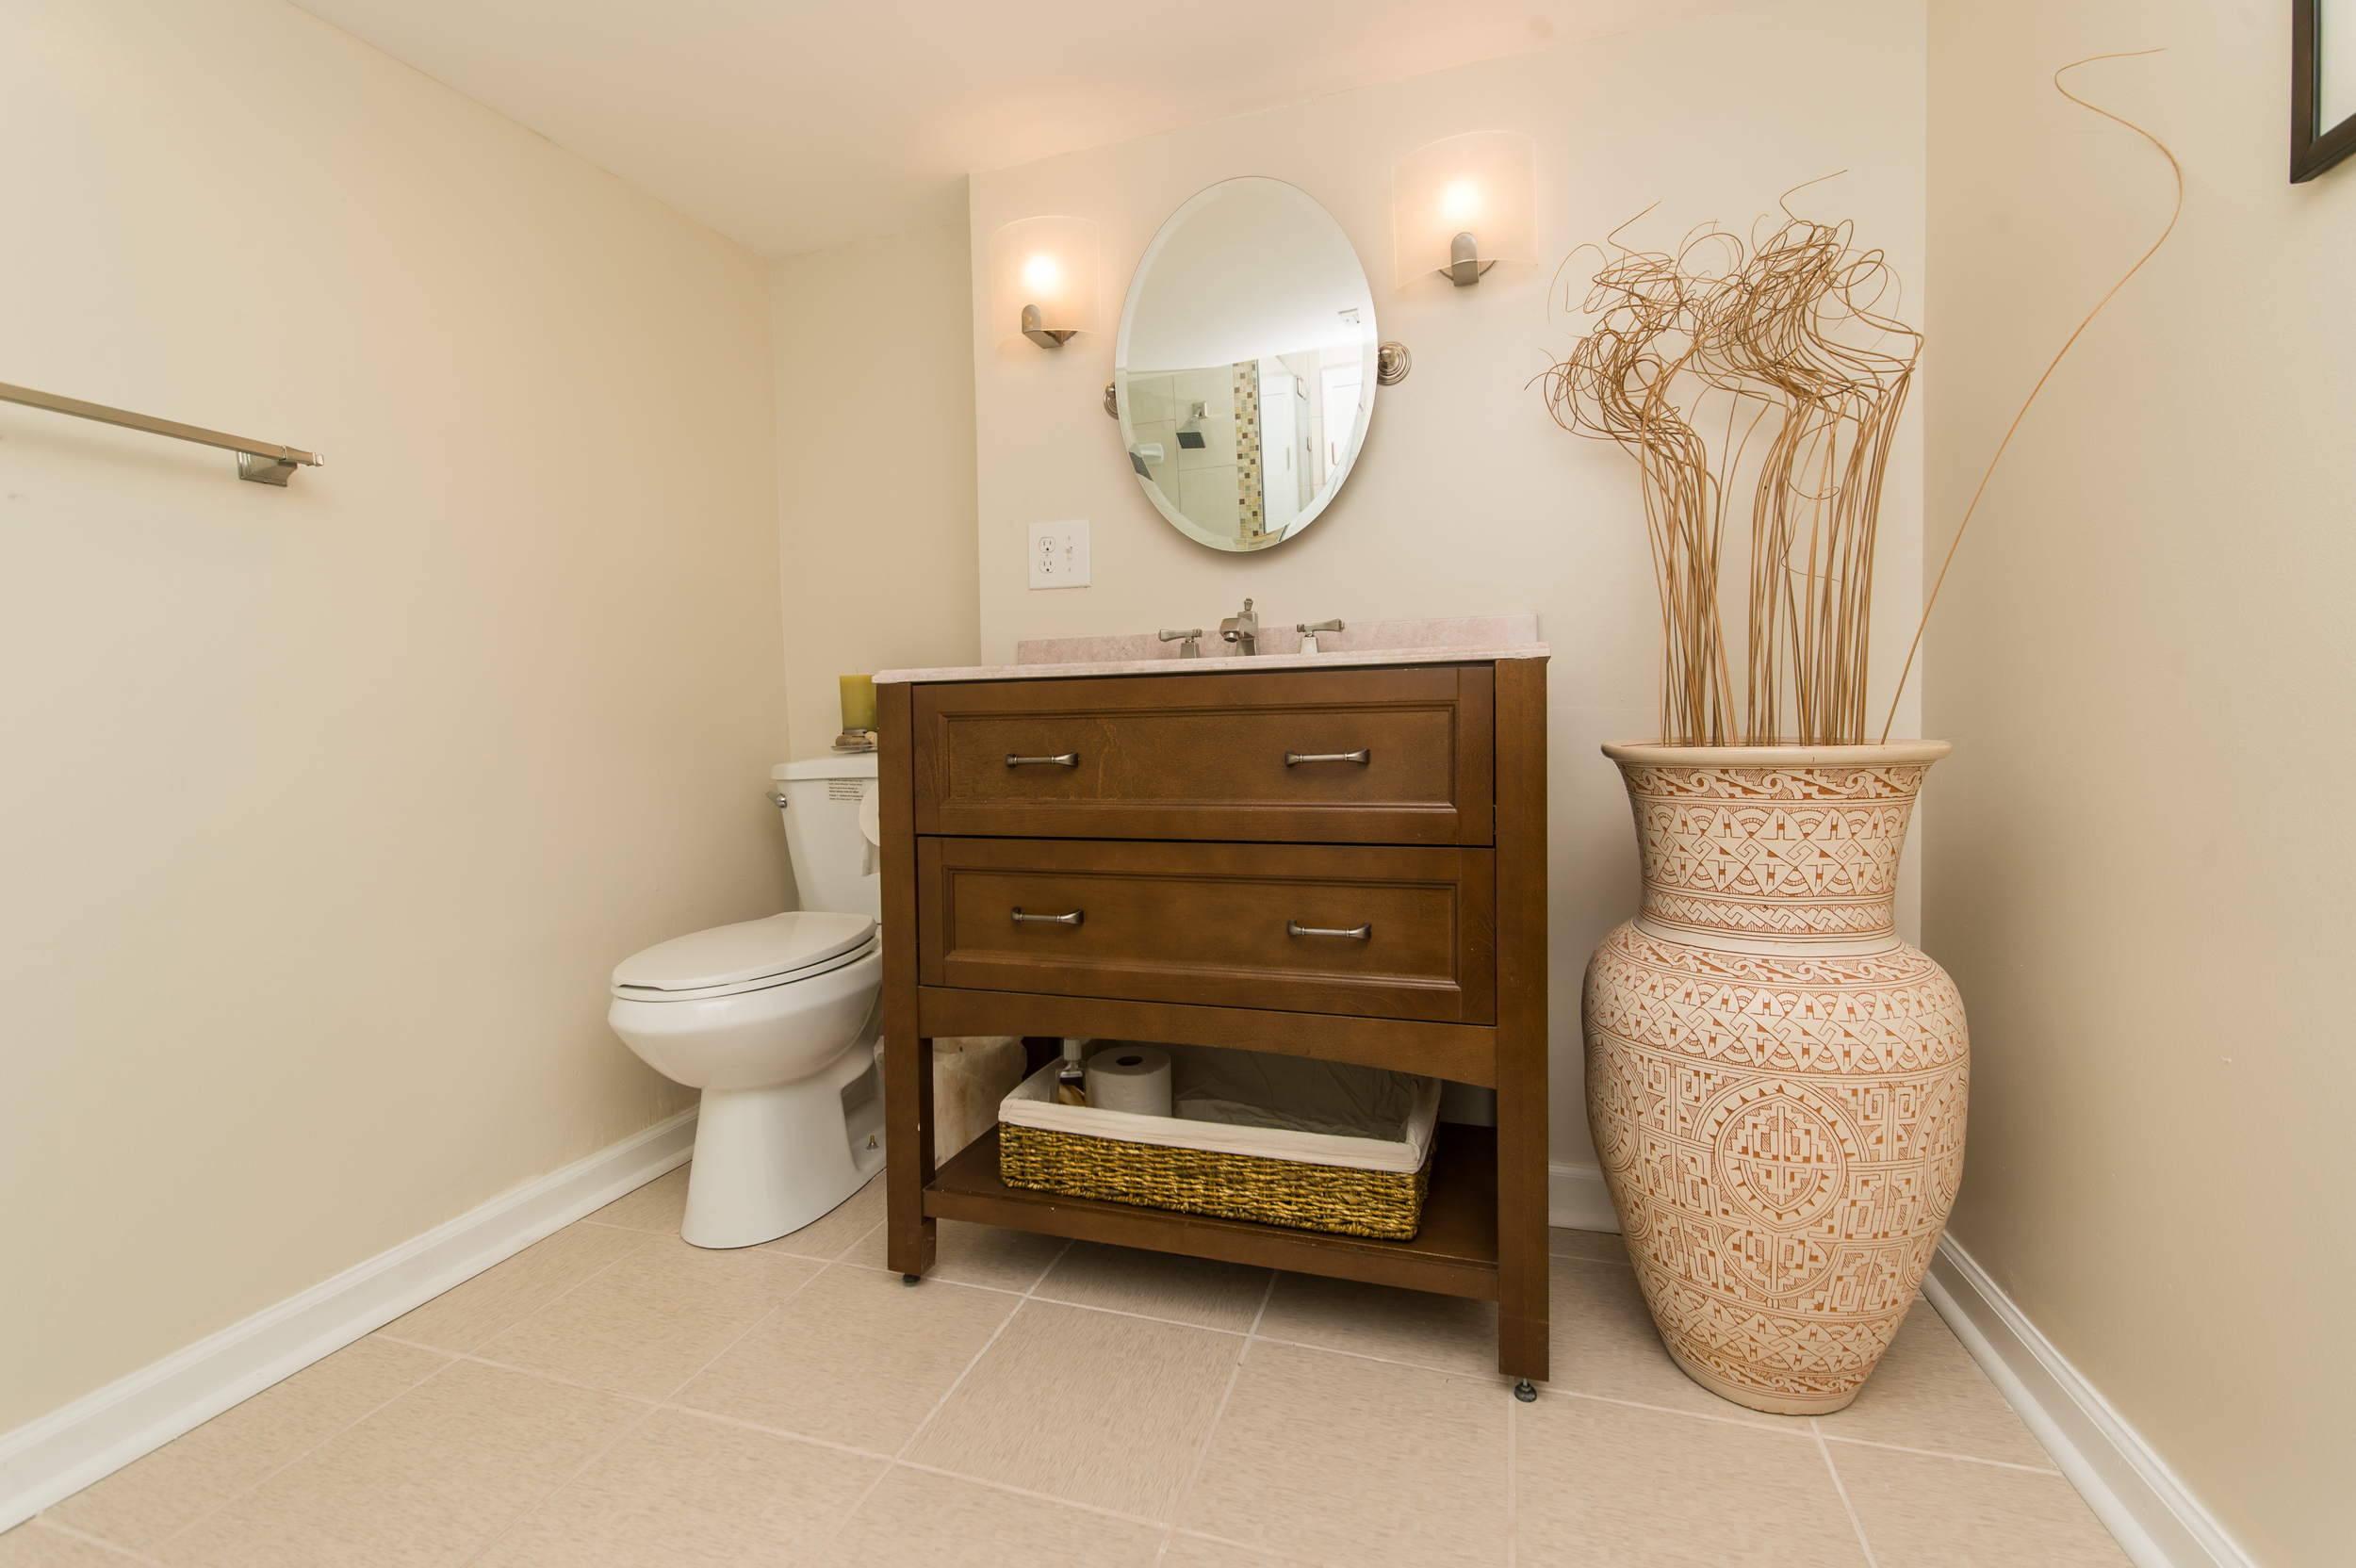 Bathroom renovation Washington, DC